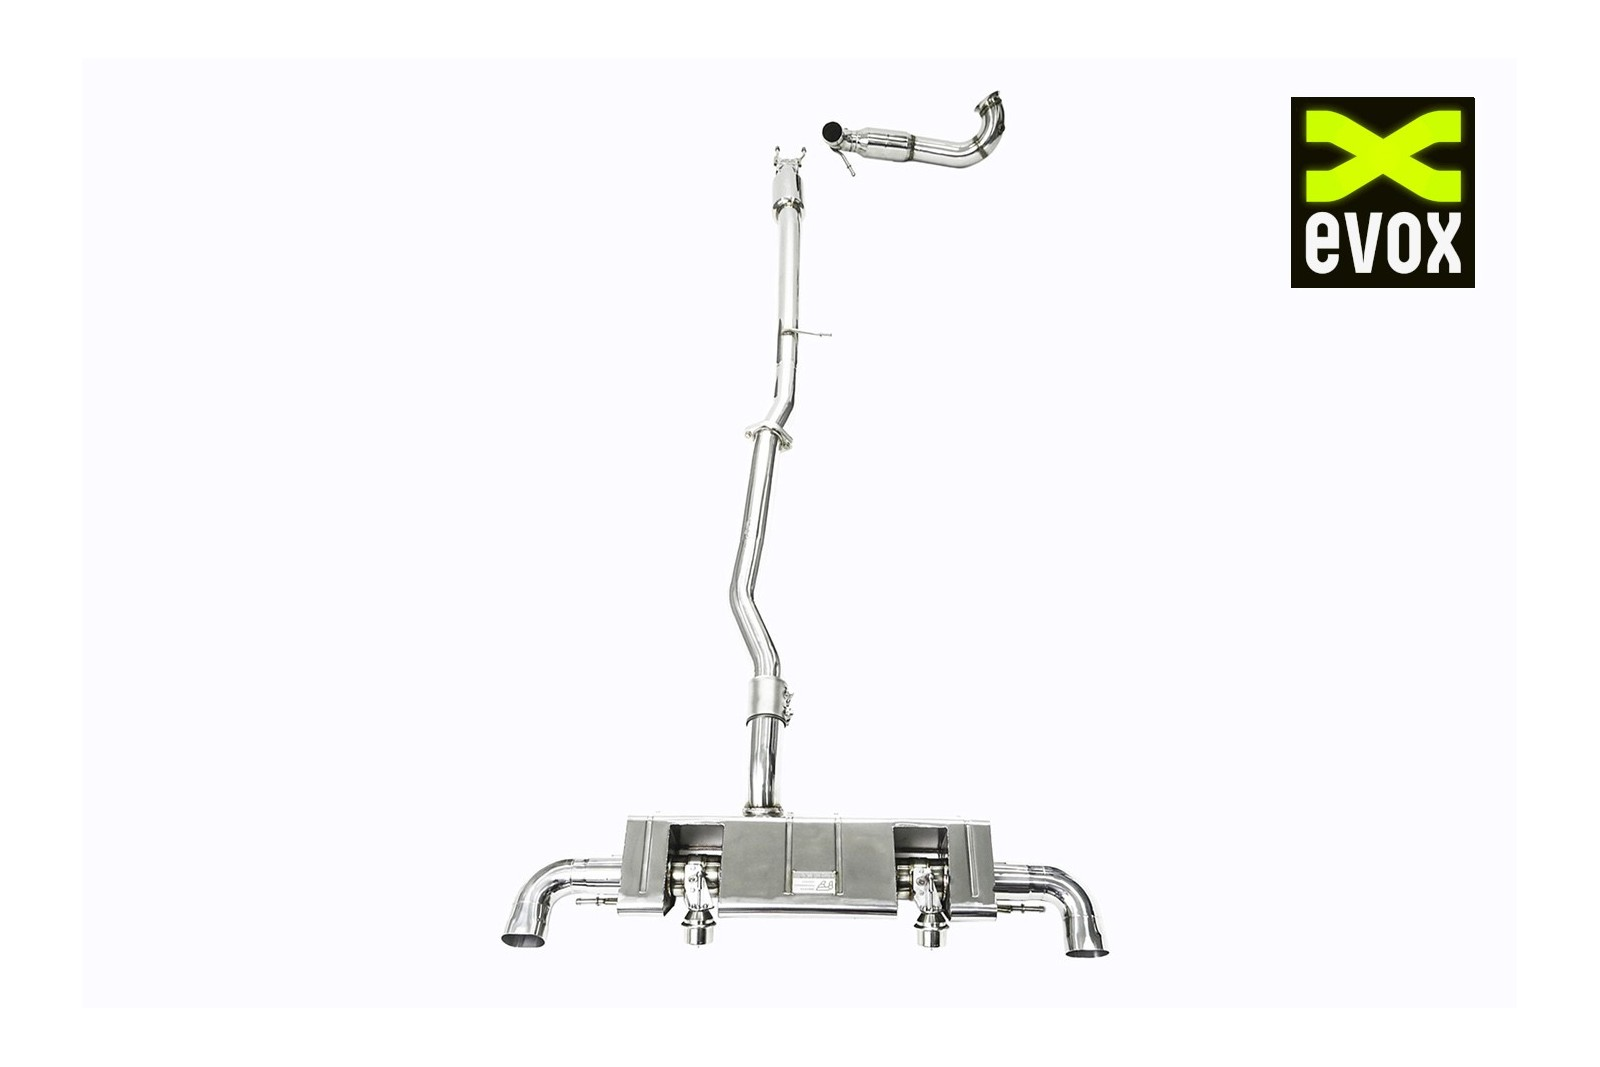 ipe exhaust system mercedes cla45 amg (c117)